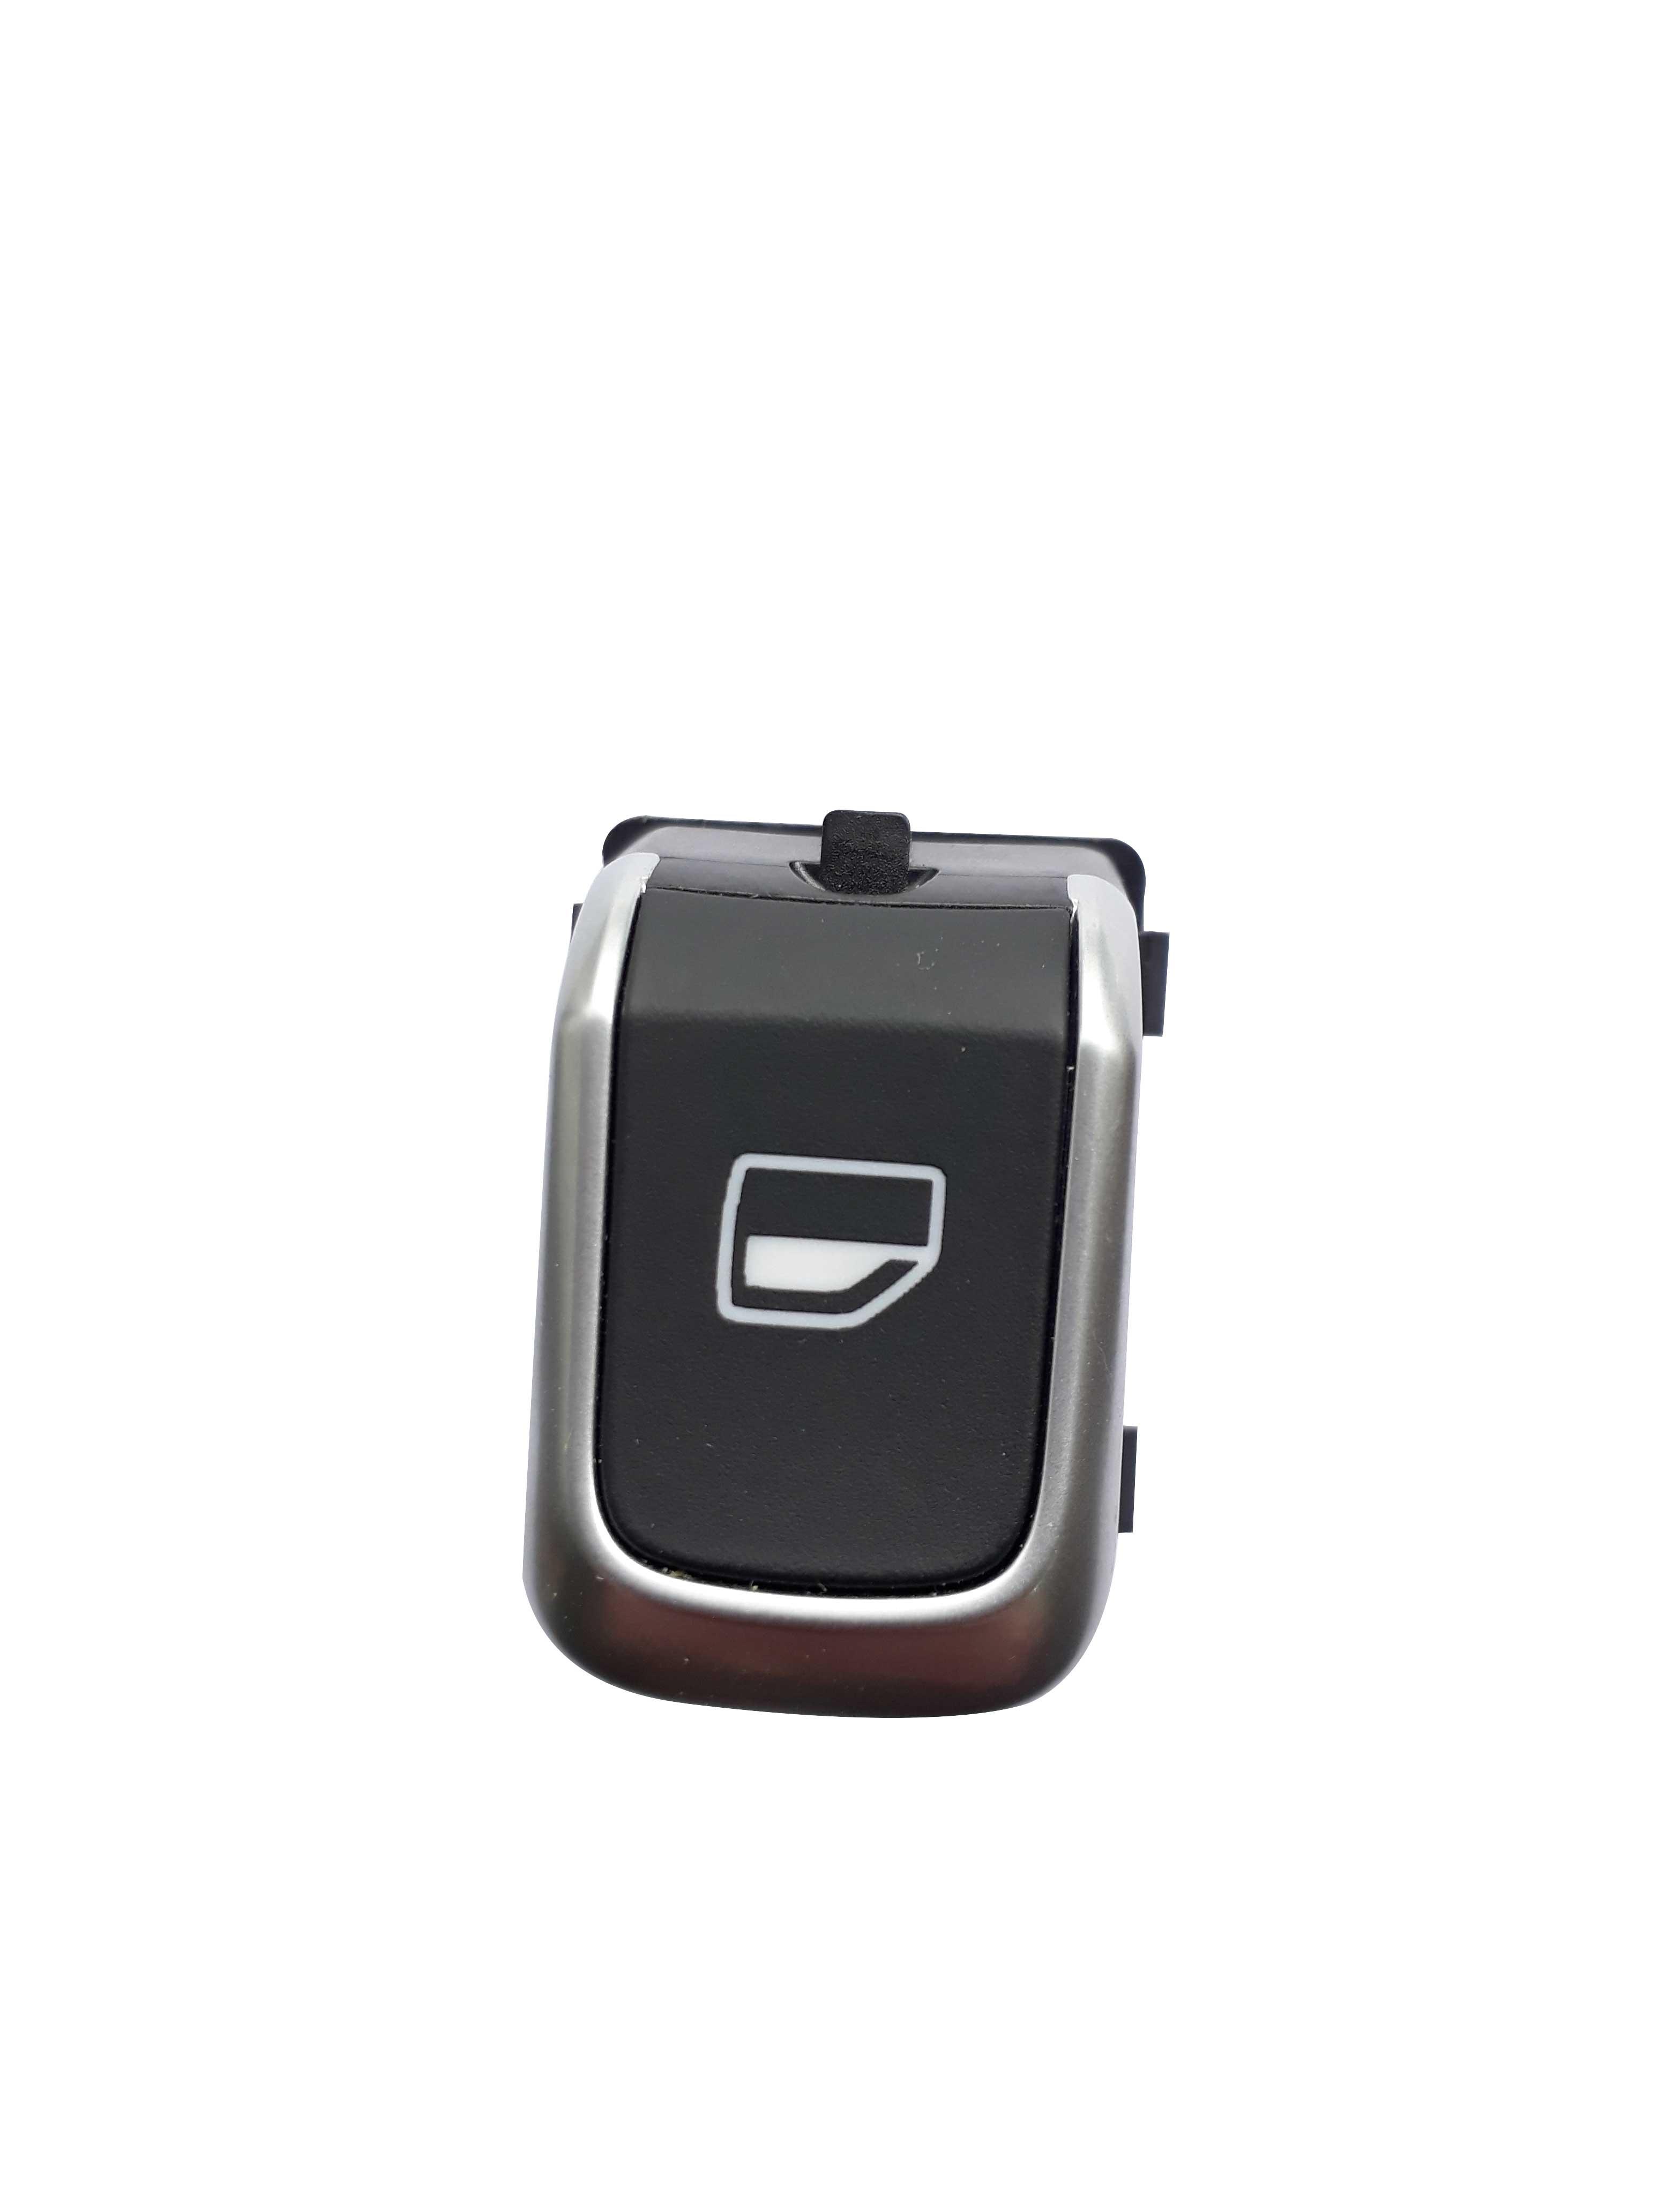 Tekli Cam Düğmesi Nikelajlı - Audi A1 - A6 - A8